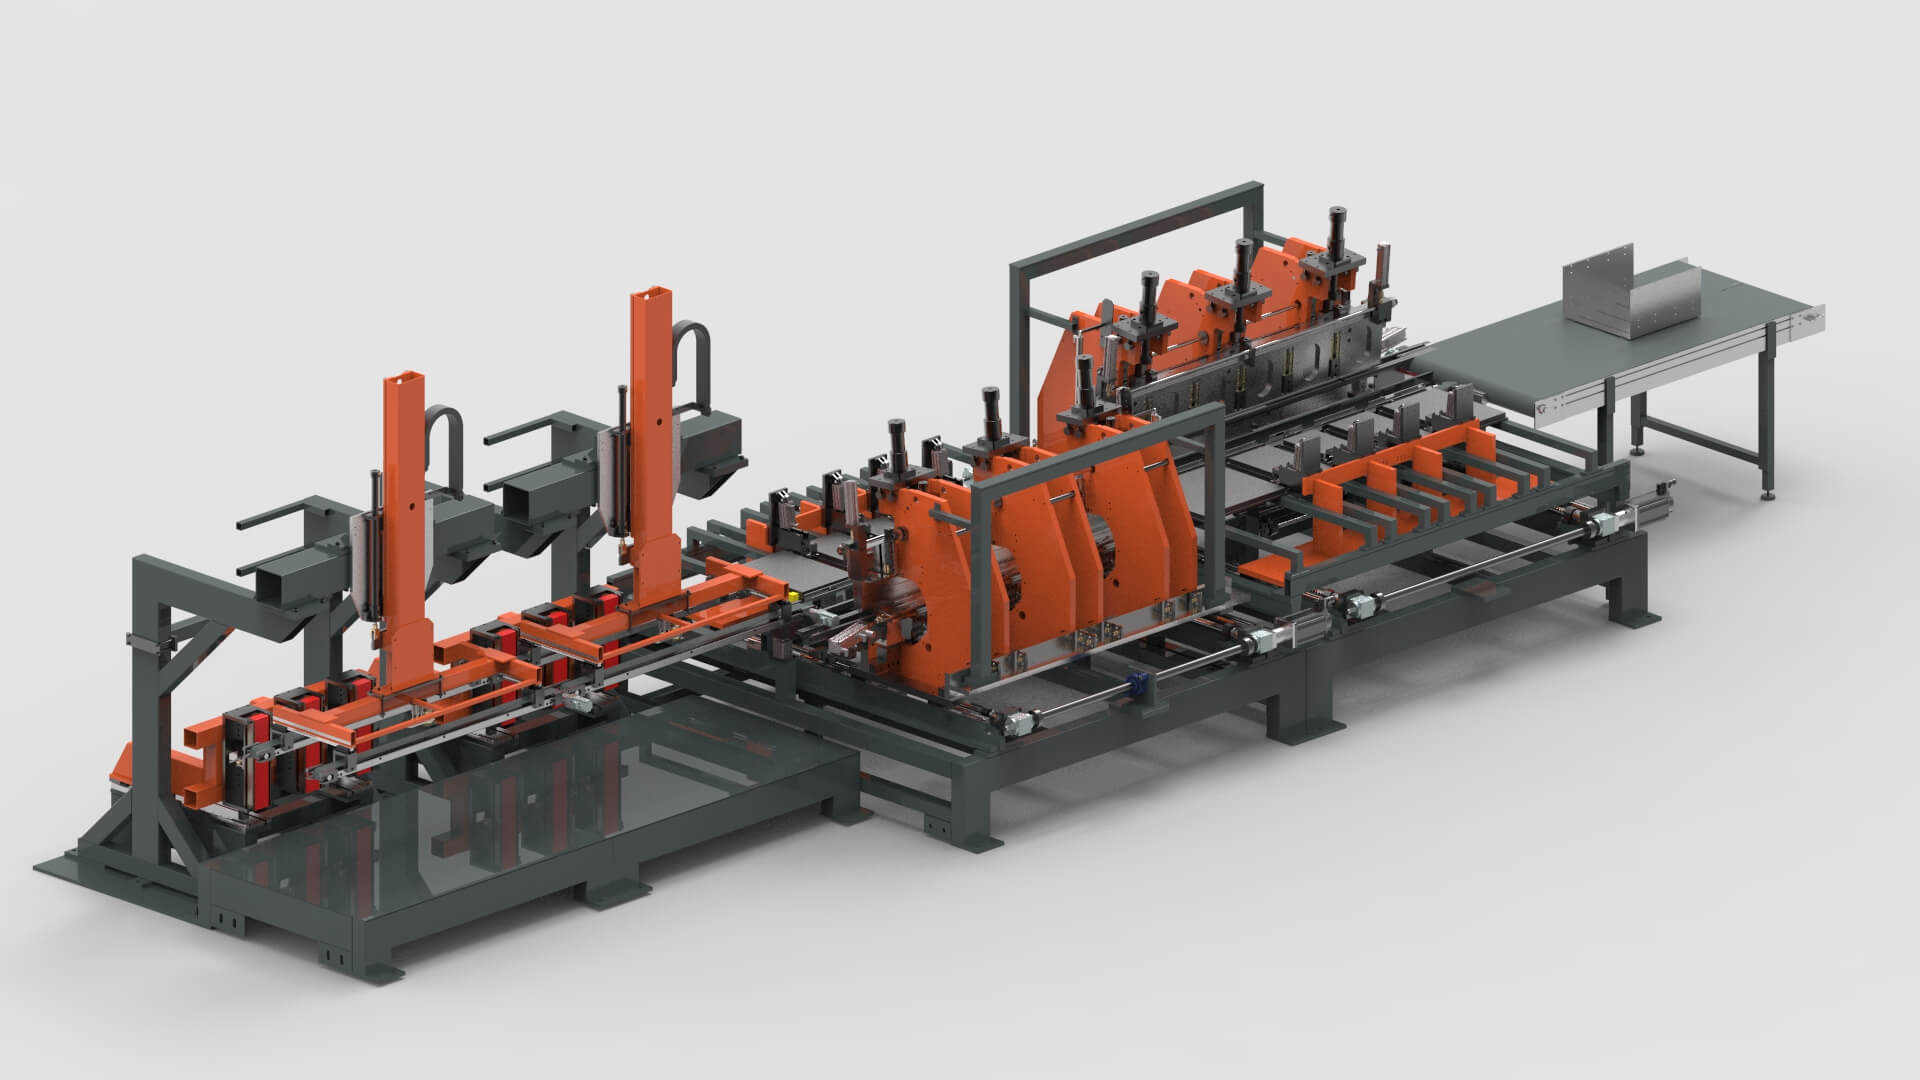 drawers-sheet-metal-bending-production-line.jpg